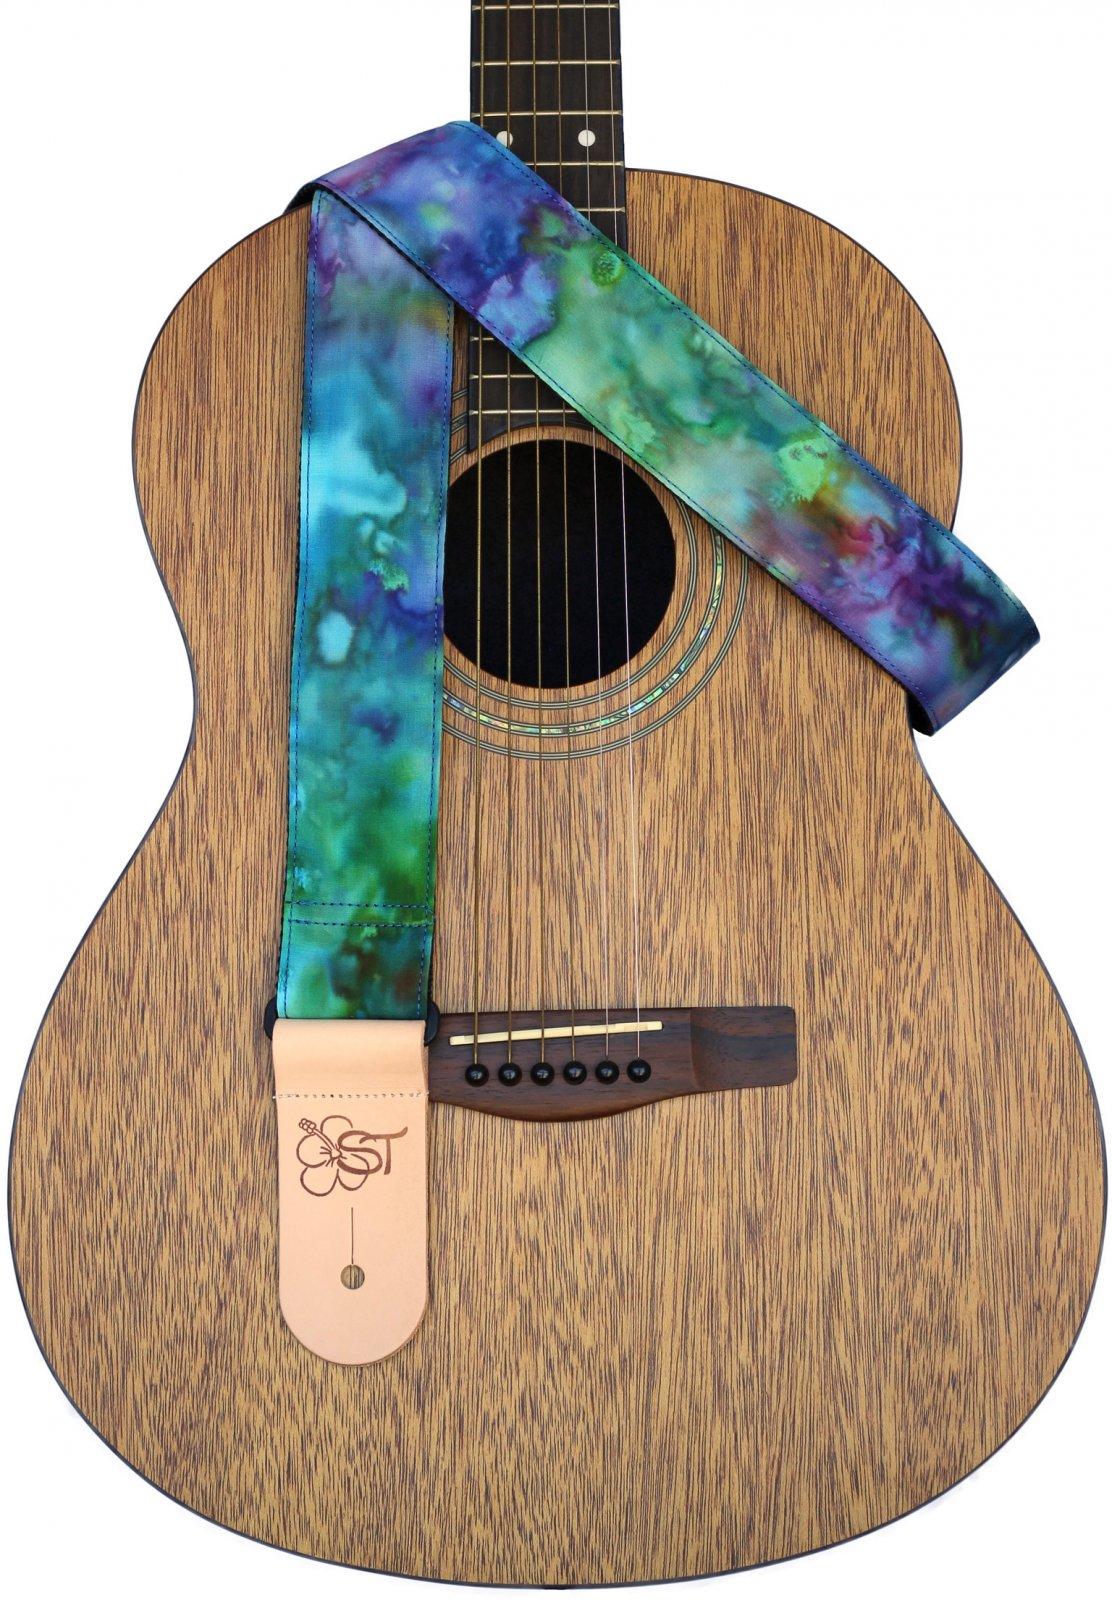 Sherrin's Threads 2 Premium Print Guitar Strap - Blue Tie-Dye